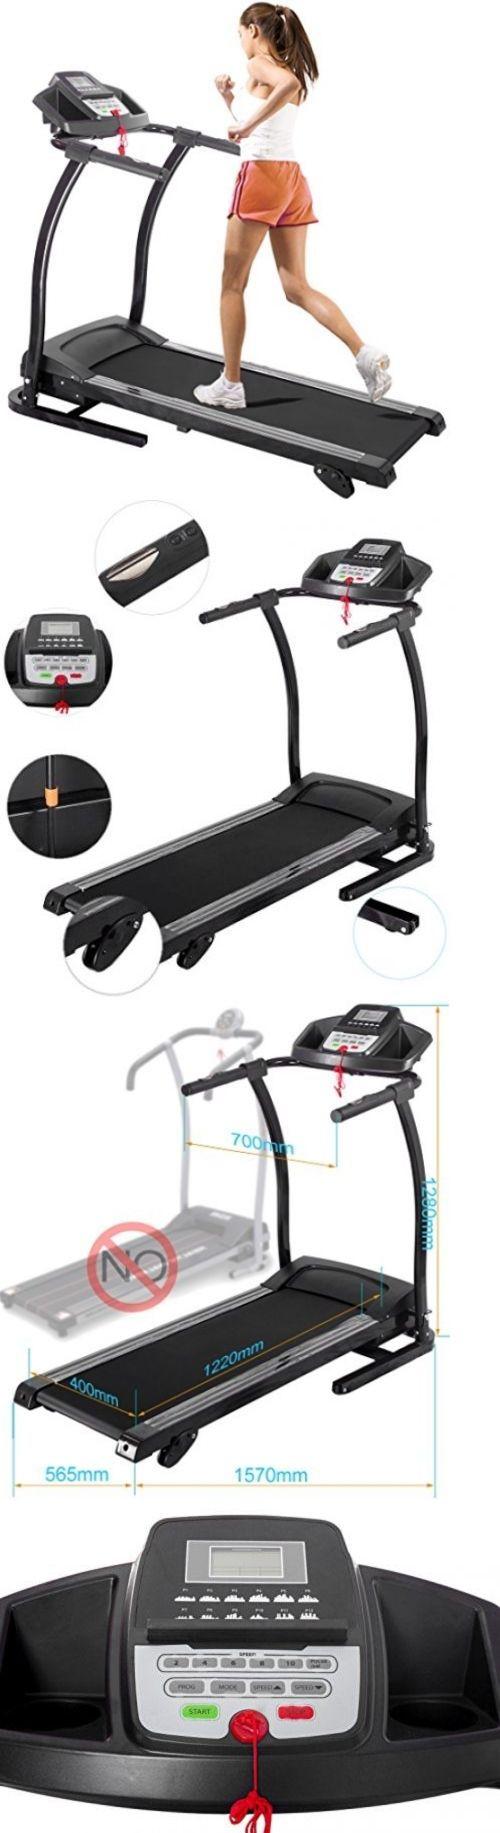 Treadmills 15280: Merax® Electric Treadmill Folding Motorized Running Machine 1.5Hp (1100W.) -> BUY IT NOW ONLY: $307.95 on eBay!